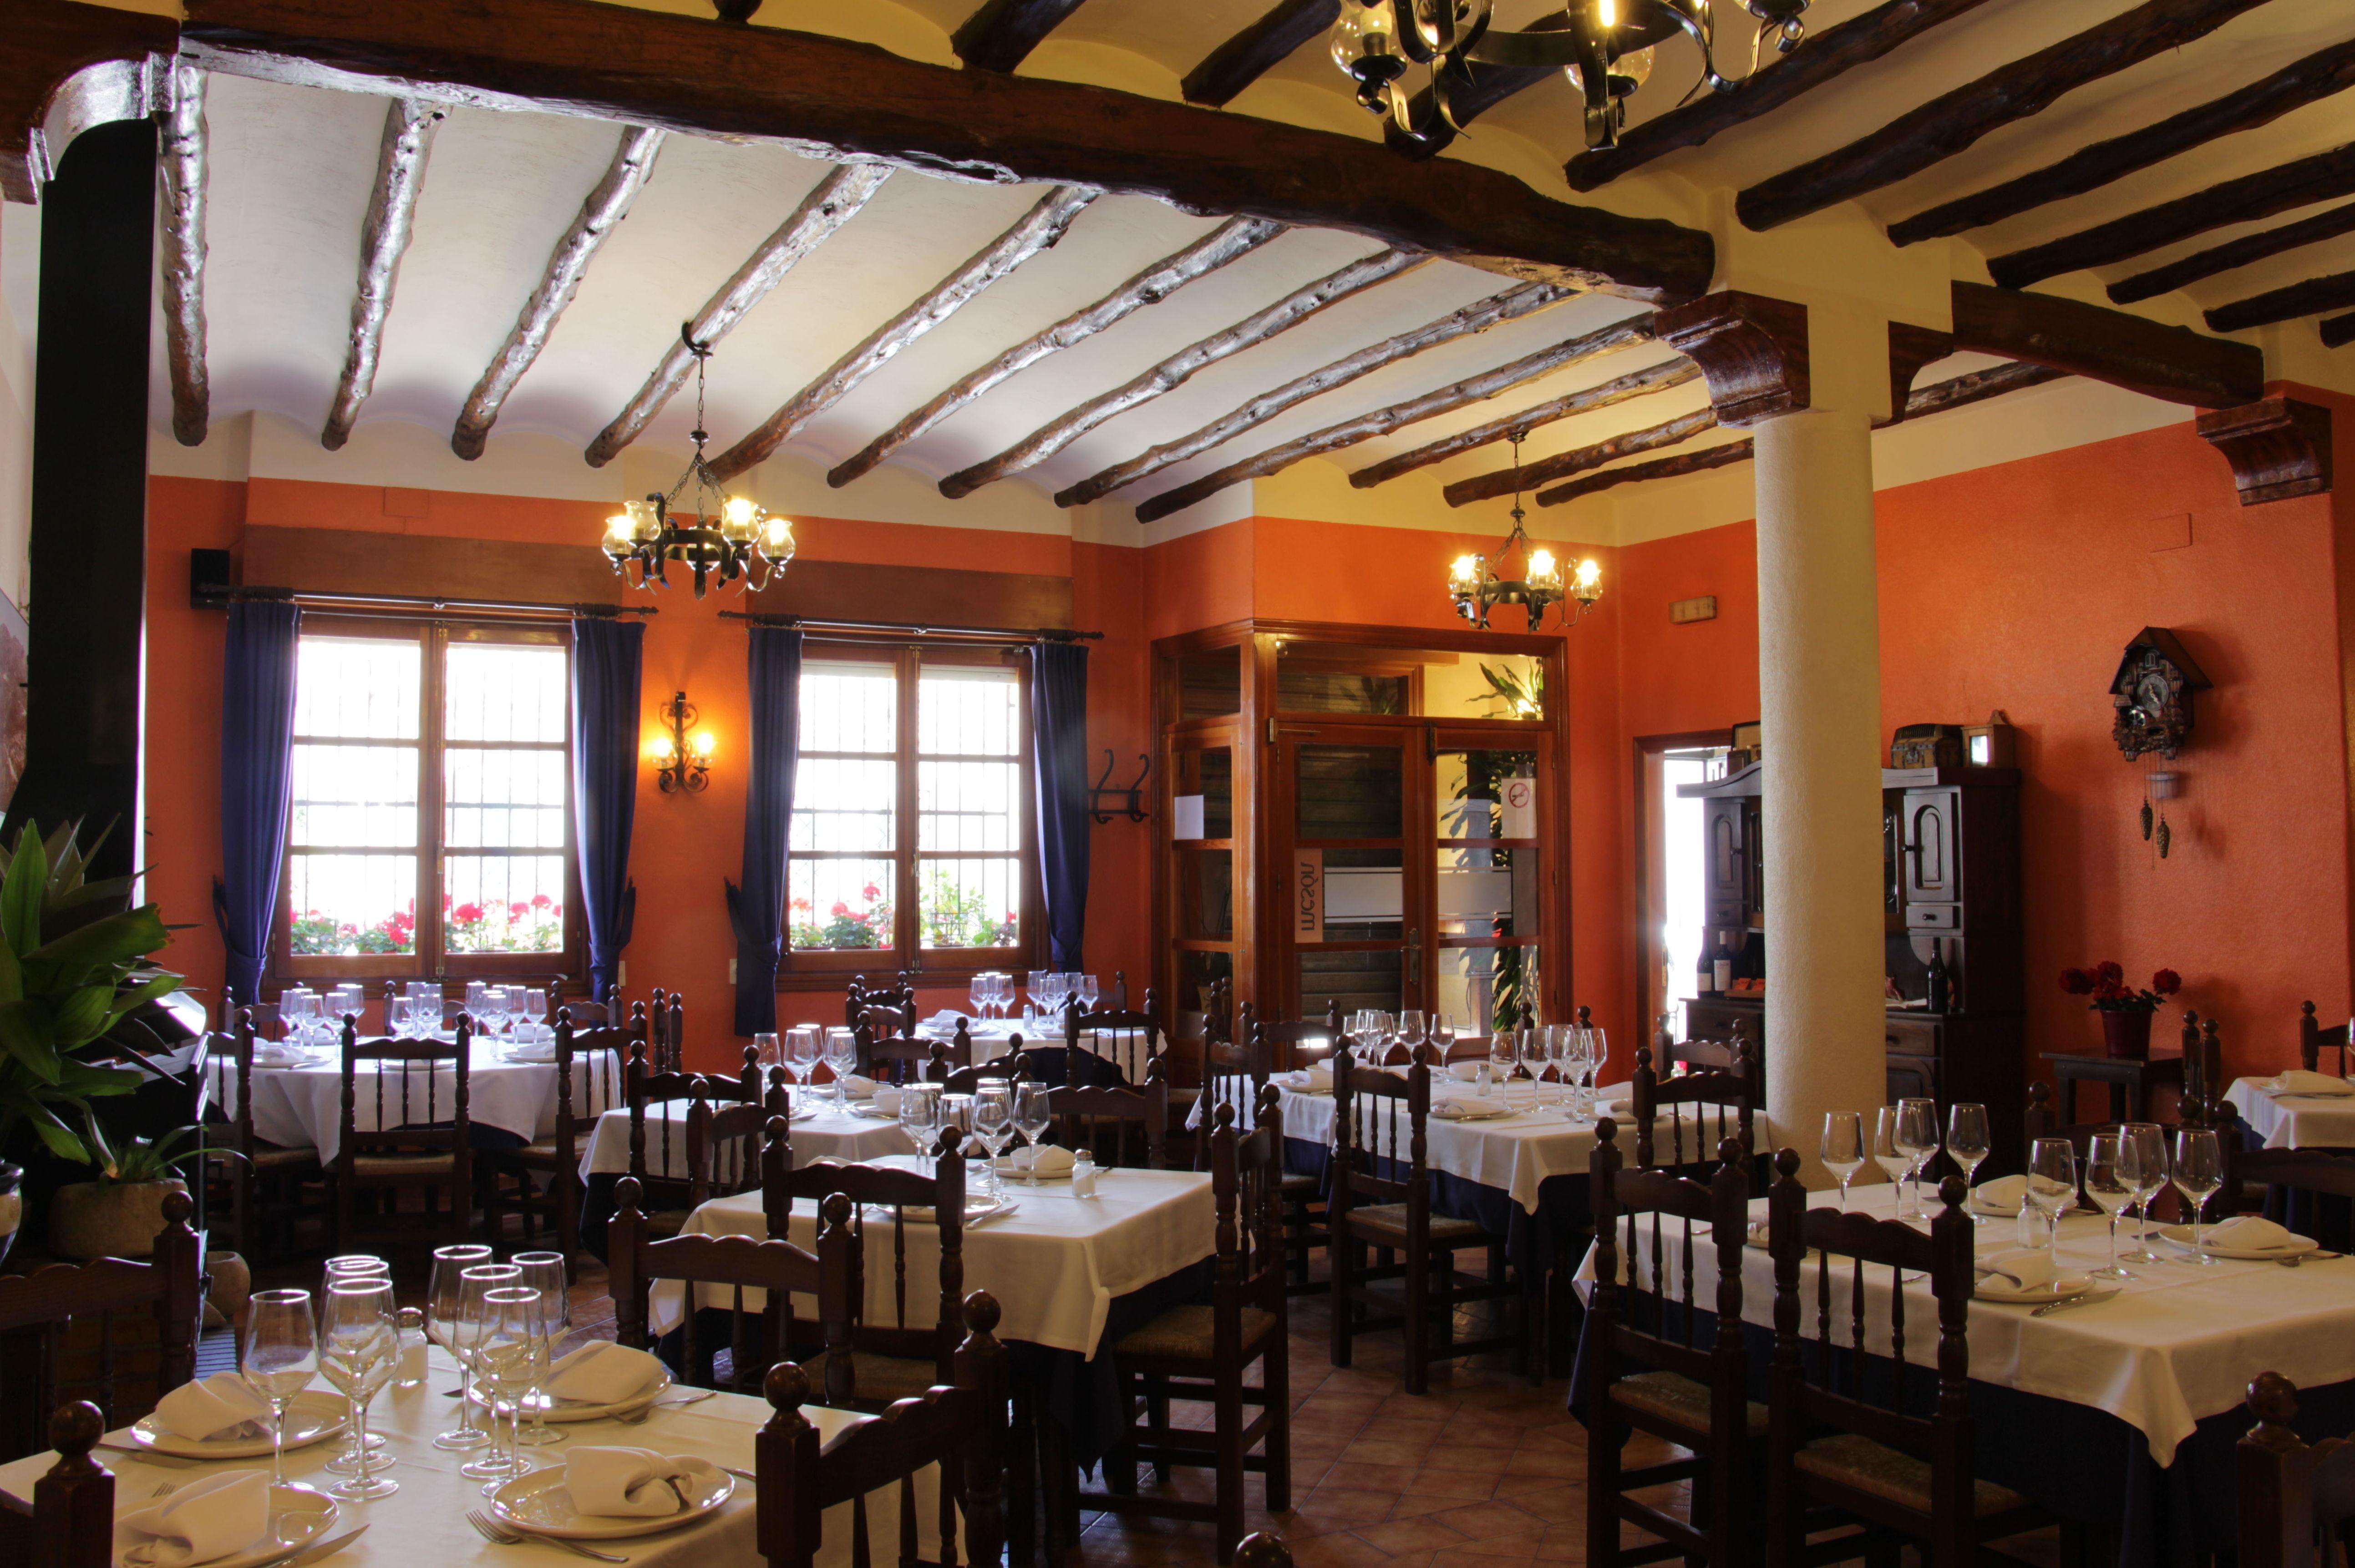 Foto 19 de Mesón - restaurante en Benimantell | Mesón Ca Rafel